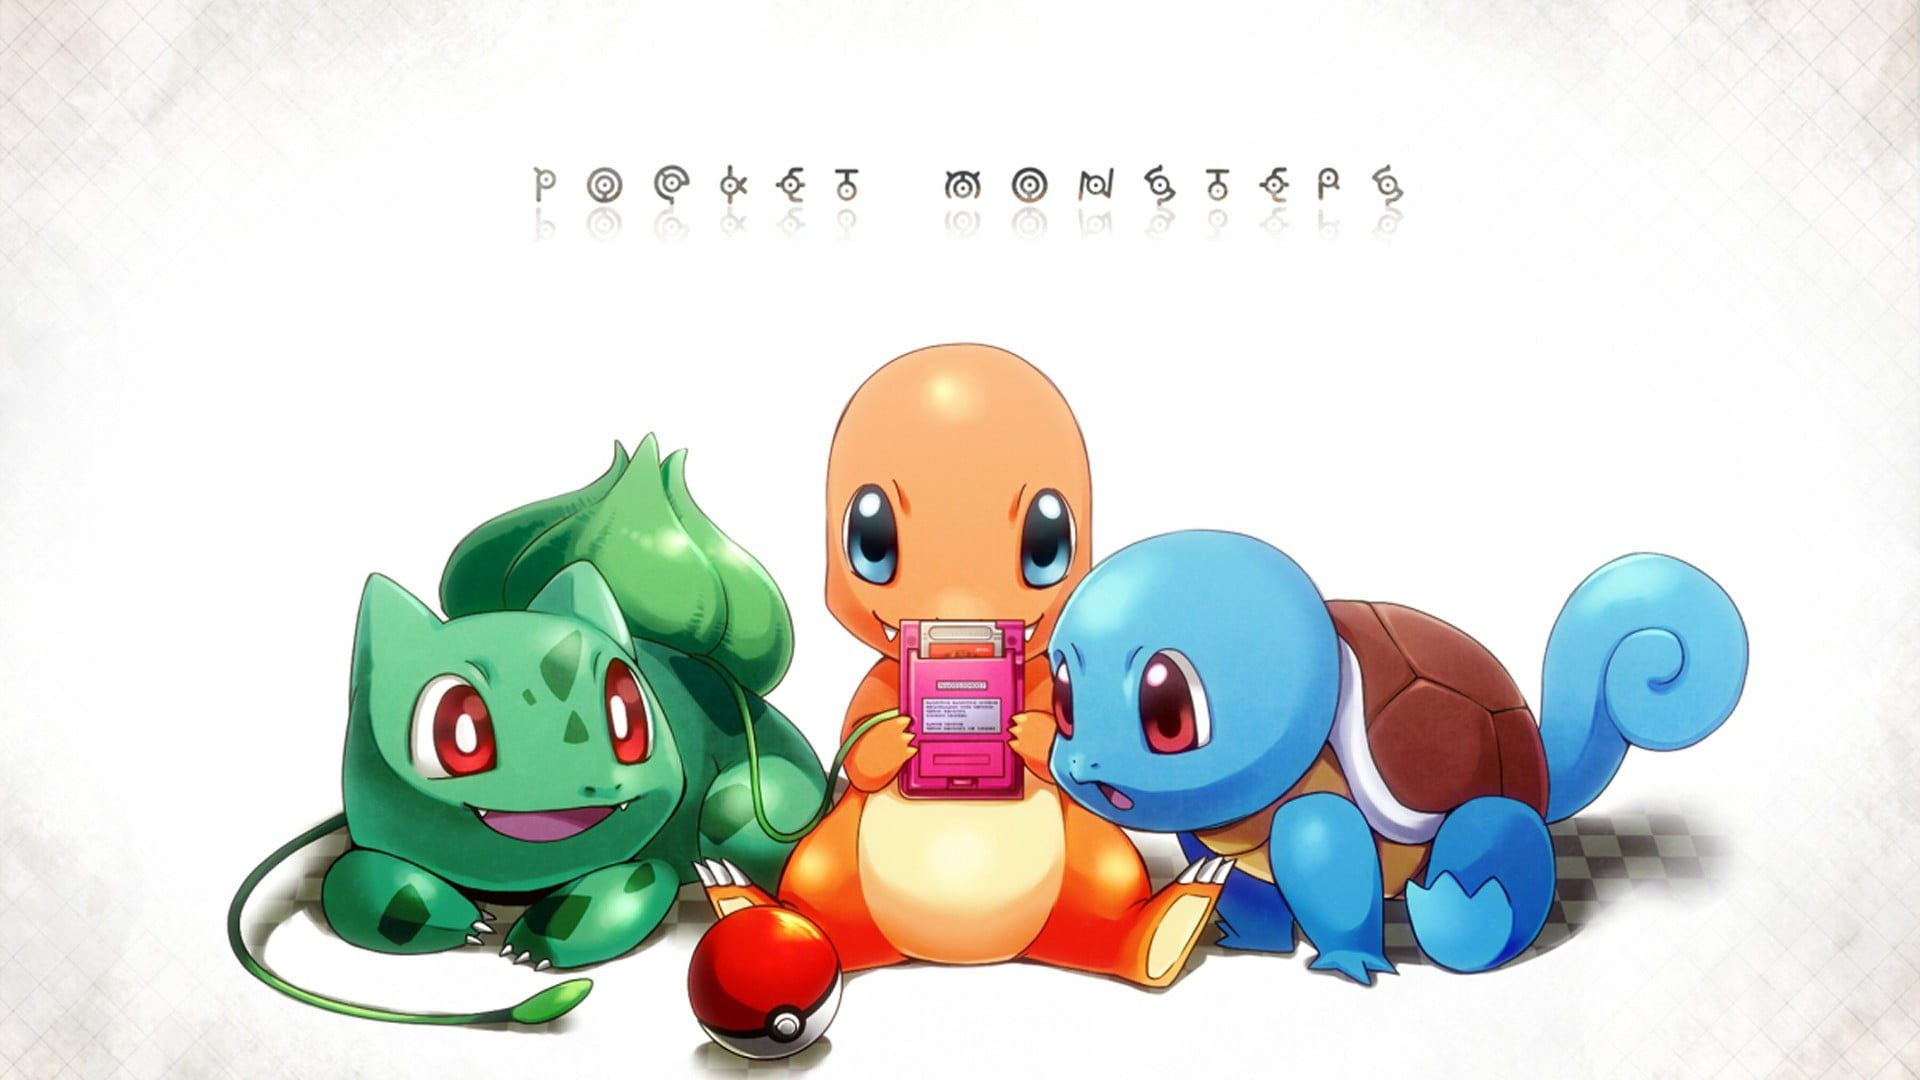 Pokemon Character Digital Wallpaper Pokemon Squirtle Bulbasaur Charmander 1080p Wallpaper Hdwallp Pokemon Poster Pokemon Coloring Pokemon Coloring Pages